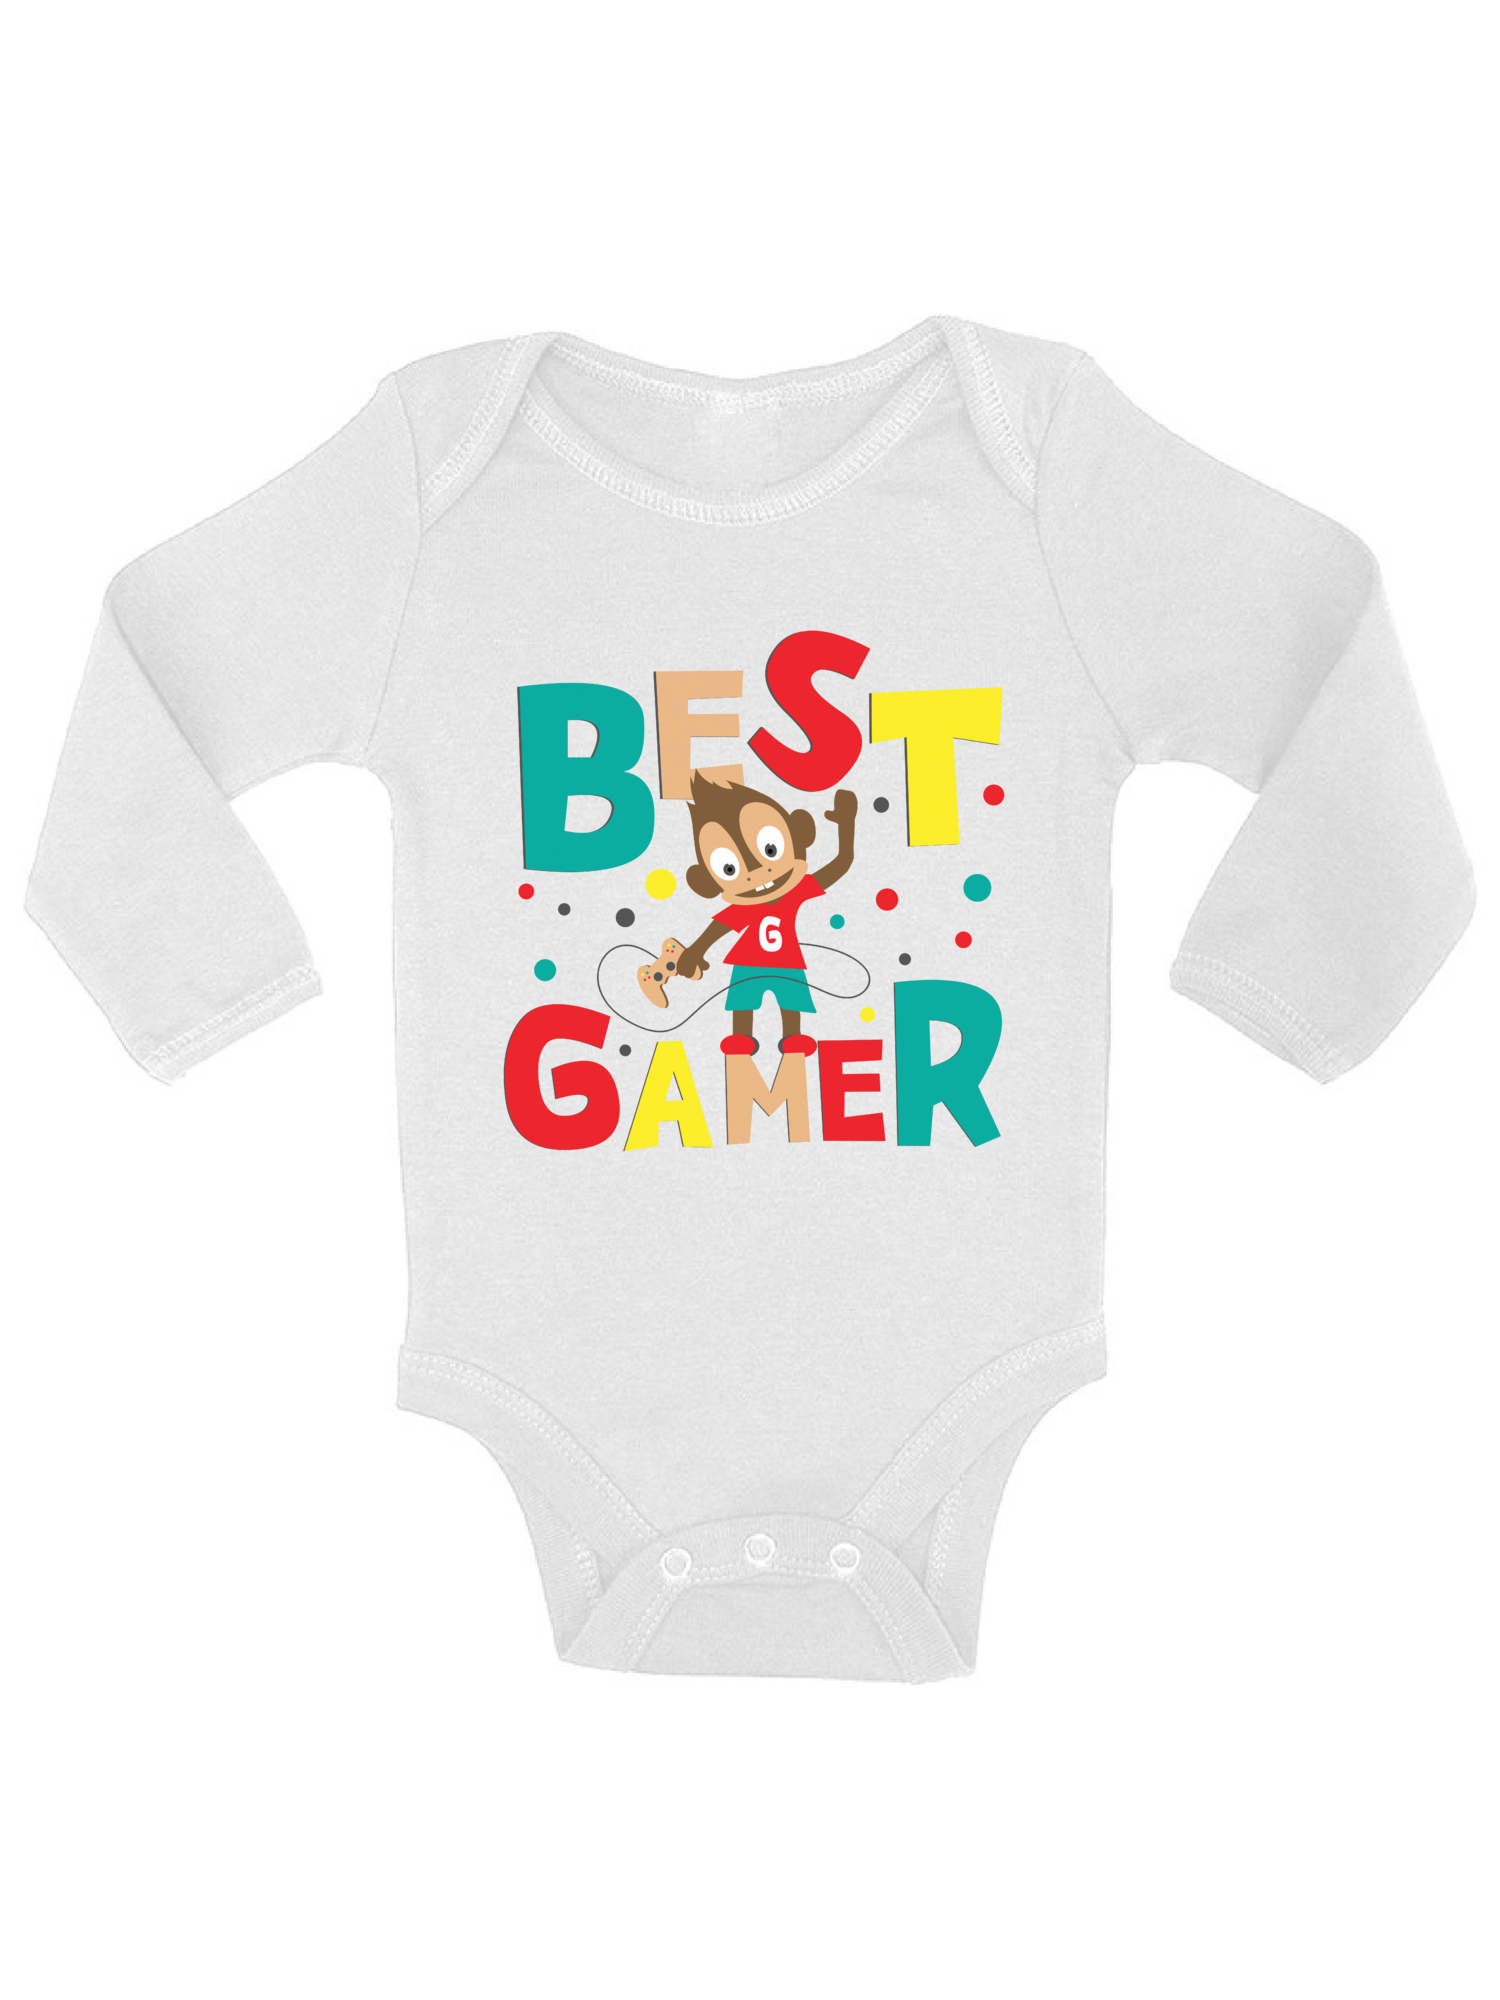 Baby boy video game bodysuit